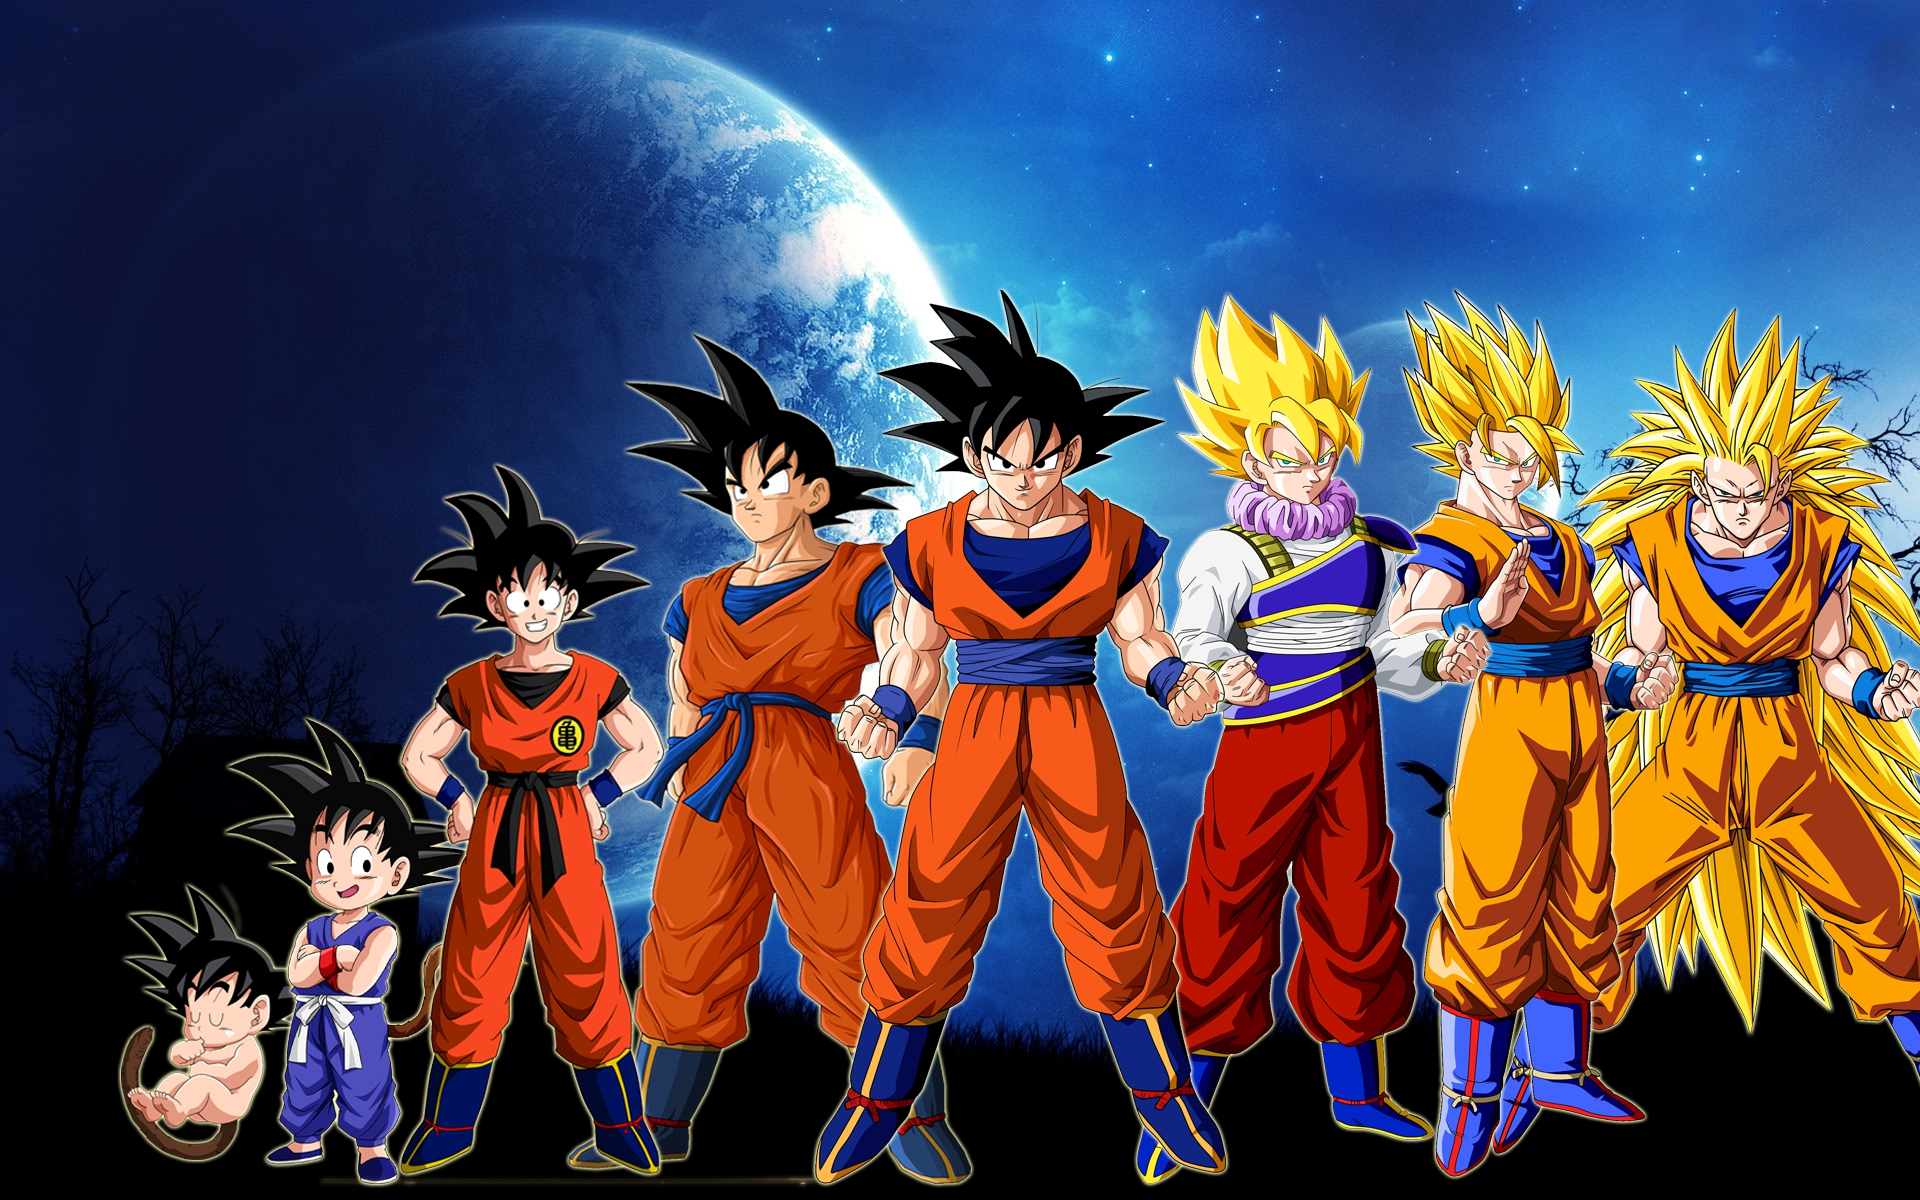 Dragonball Z Goku Evolution HD Wallpaper of Anime 1920x1200